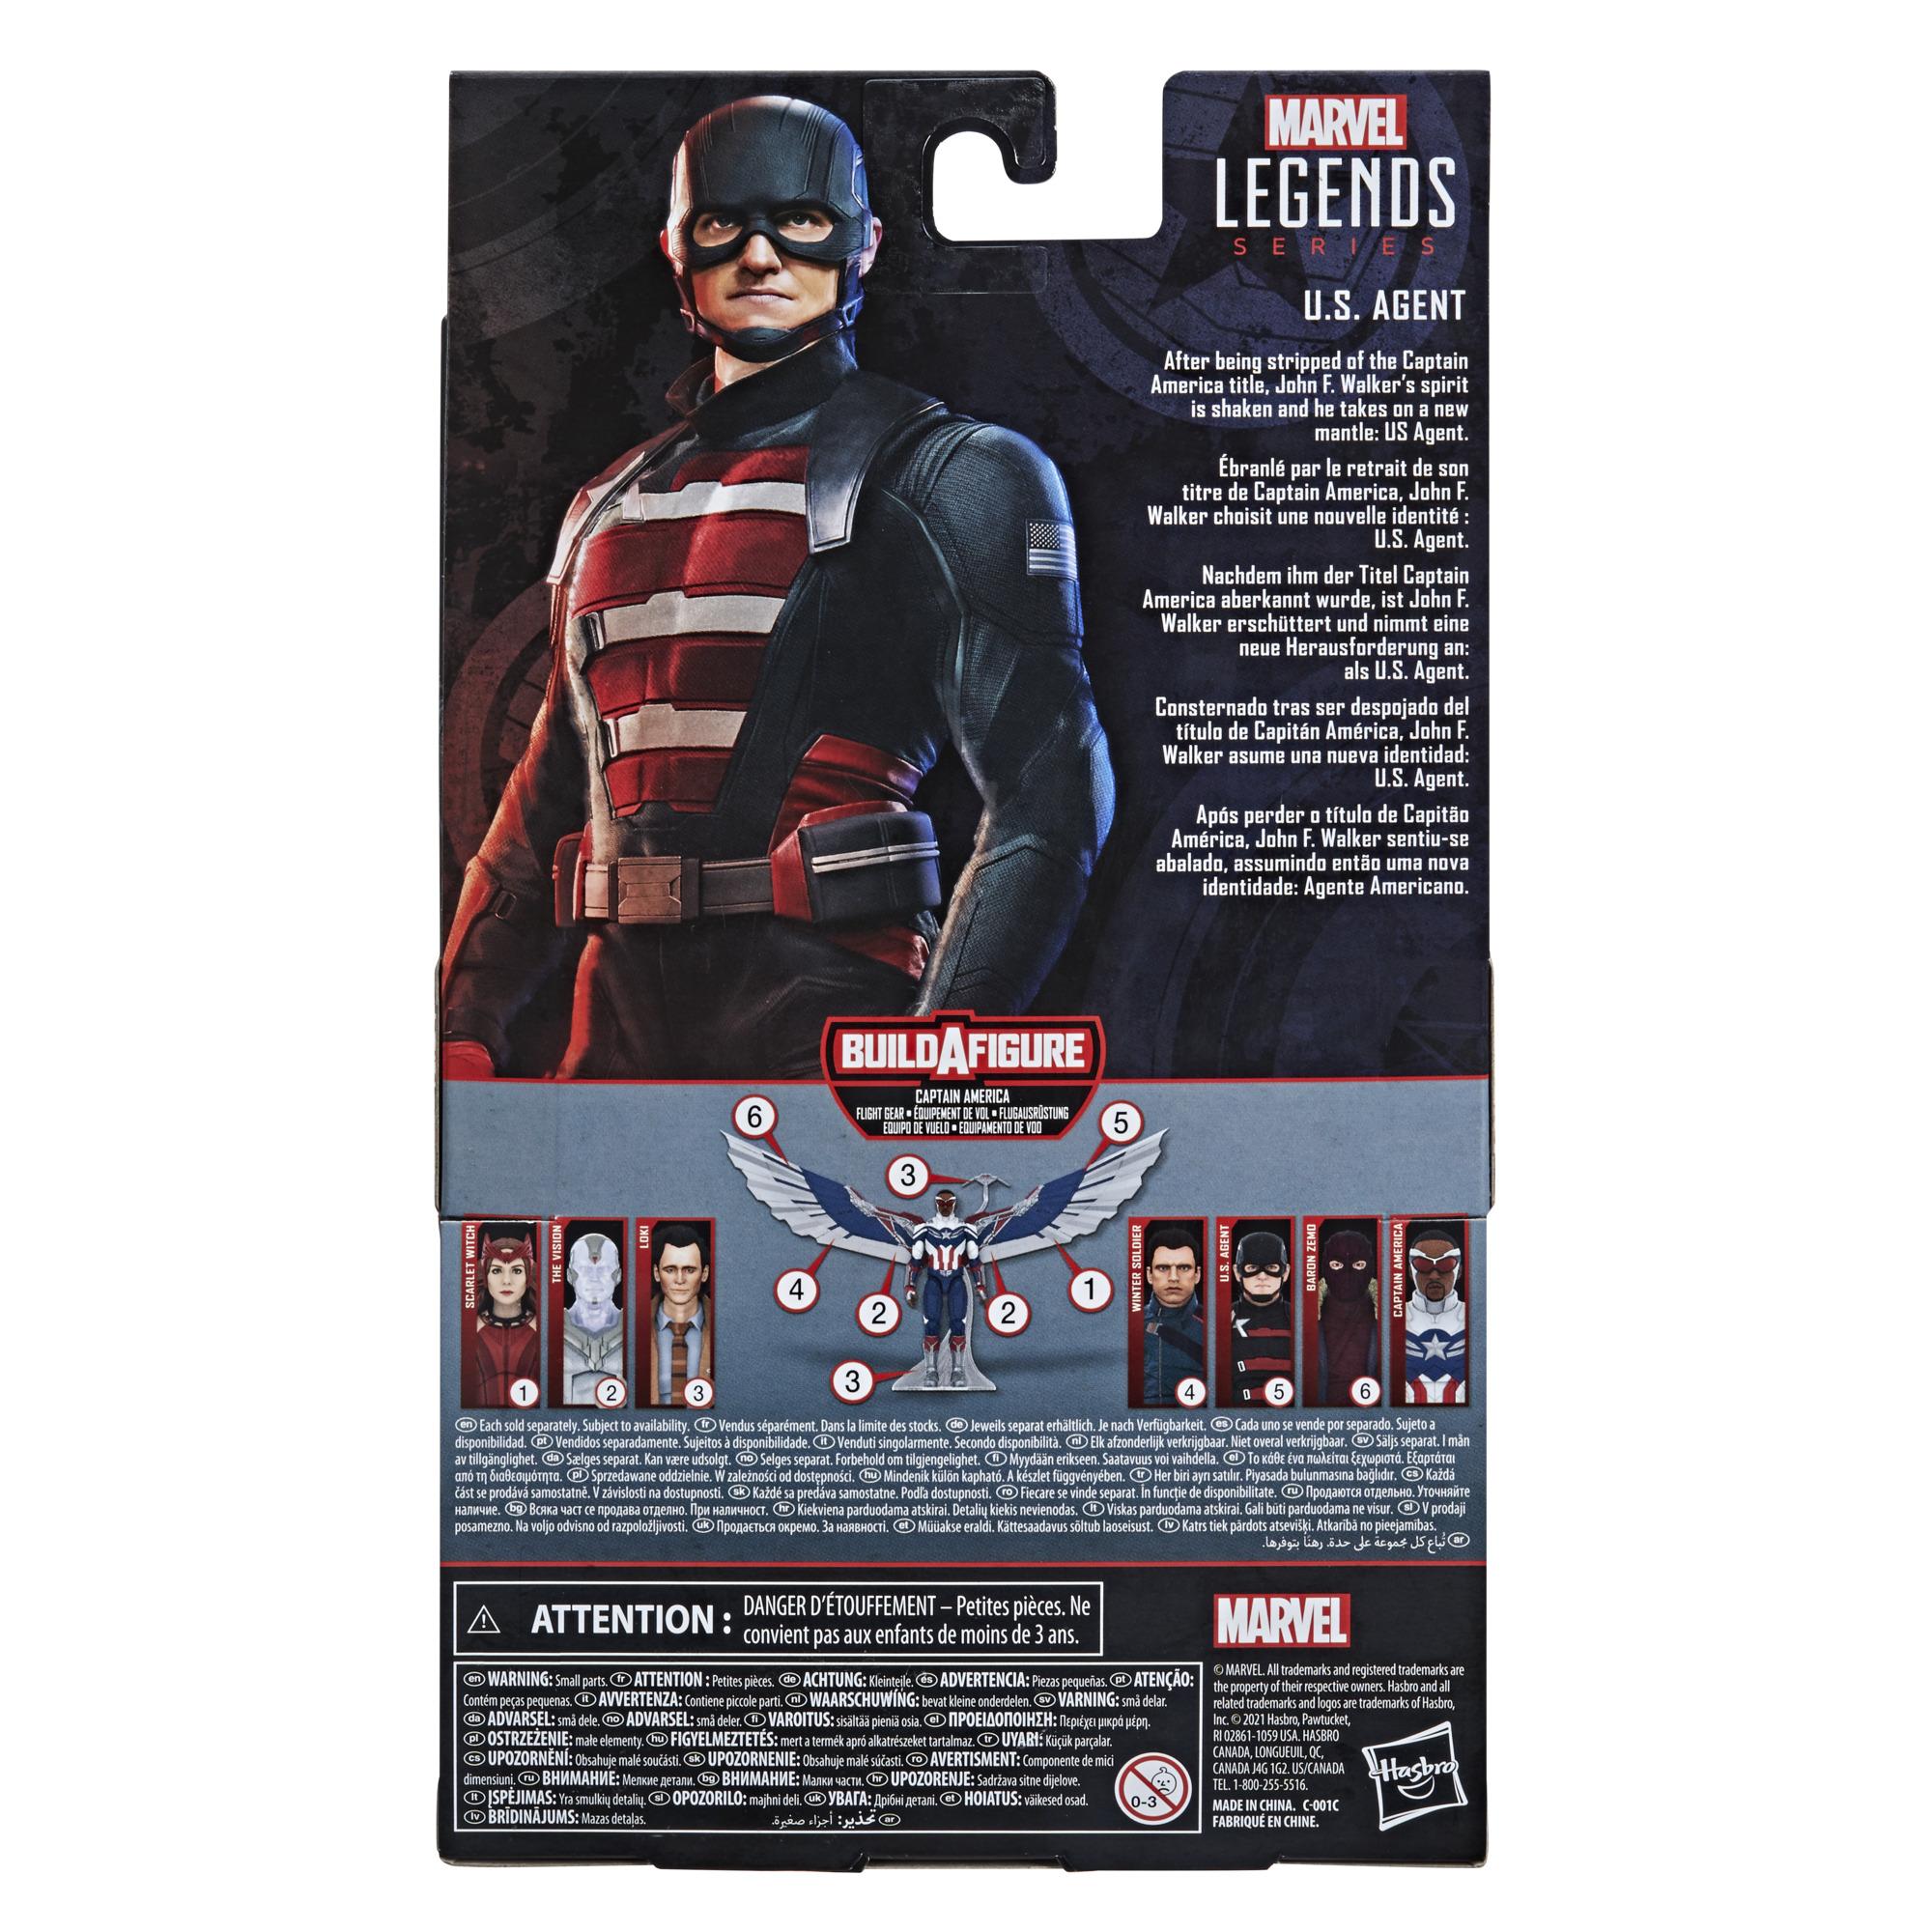 Marvel Legends Series Action Figure U.S. Agent Build a Figure F0246  5010993790814